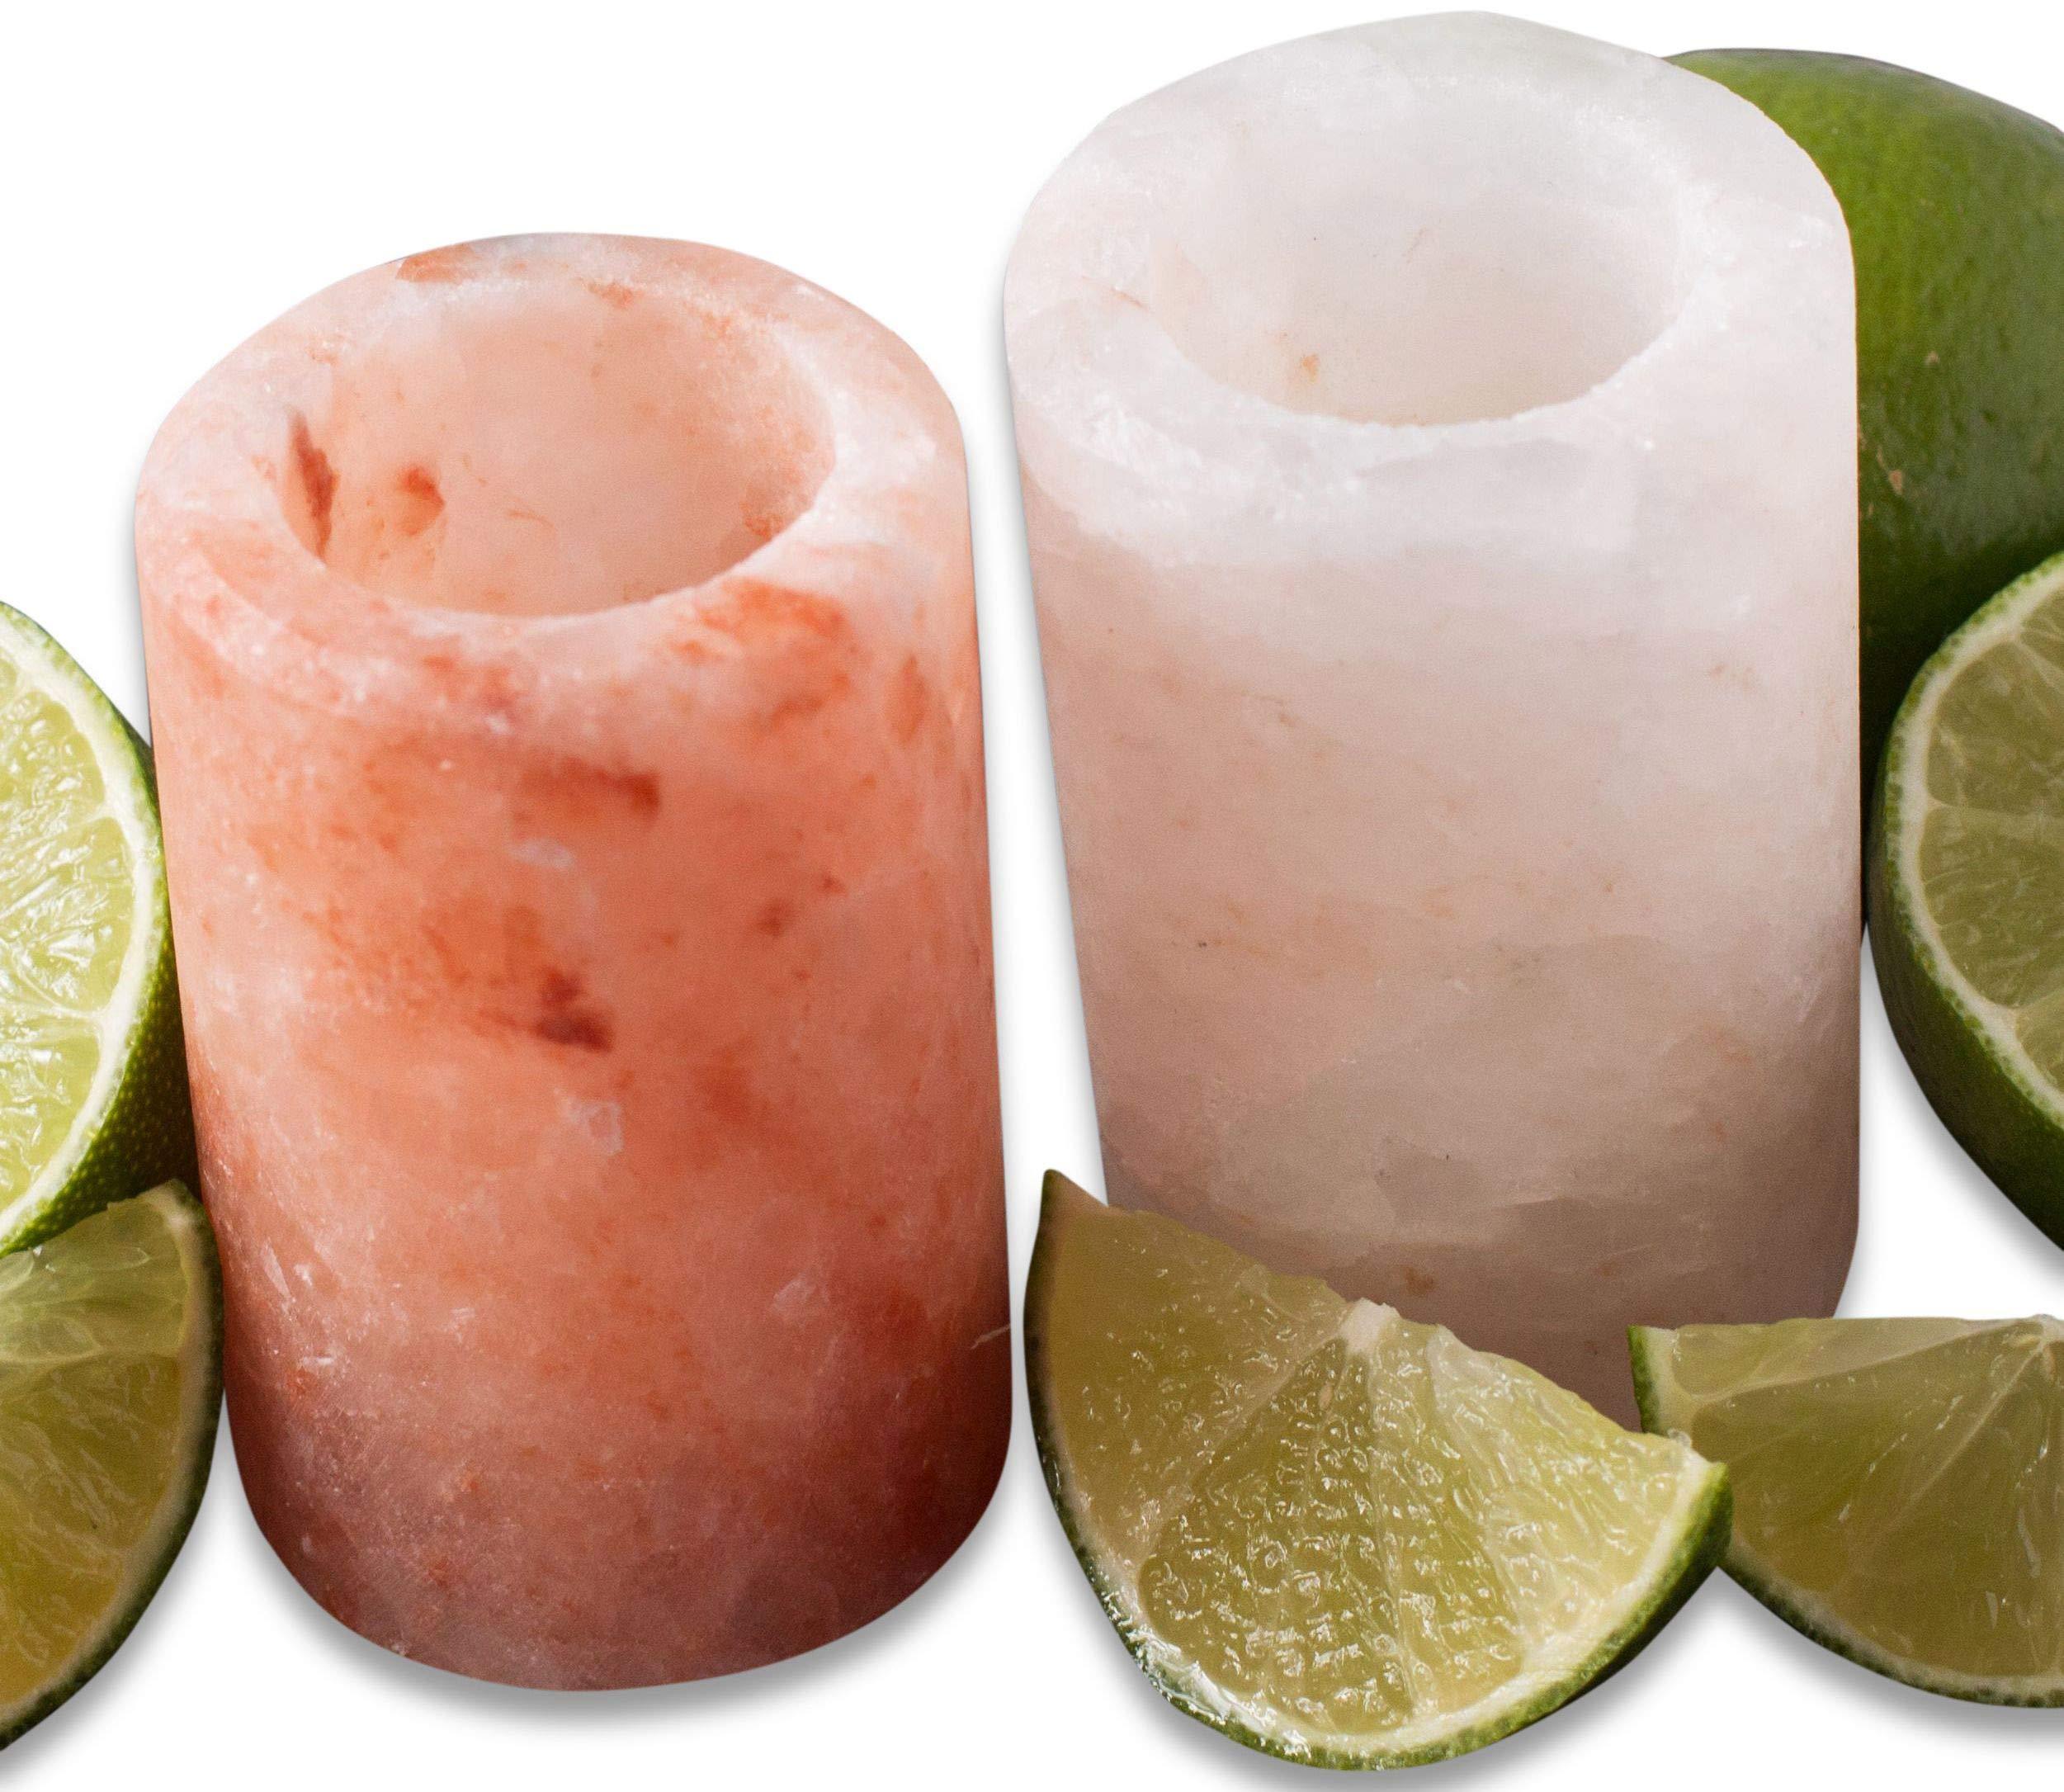 Salt Shot Glasses : Pure Himalayan Pink Salt Tequila Shot Glass Set - 100% Premium Food Grade Himalayan Salt - No Fillers or Binders - Exceeds FDA and European Requirements | Cestari Kitchen (2 pack)